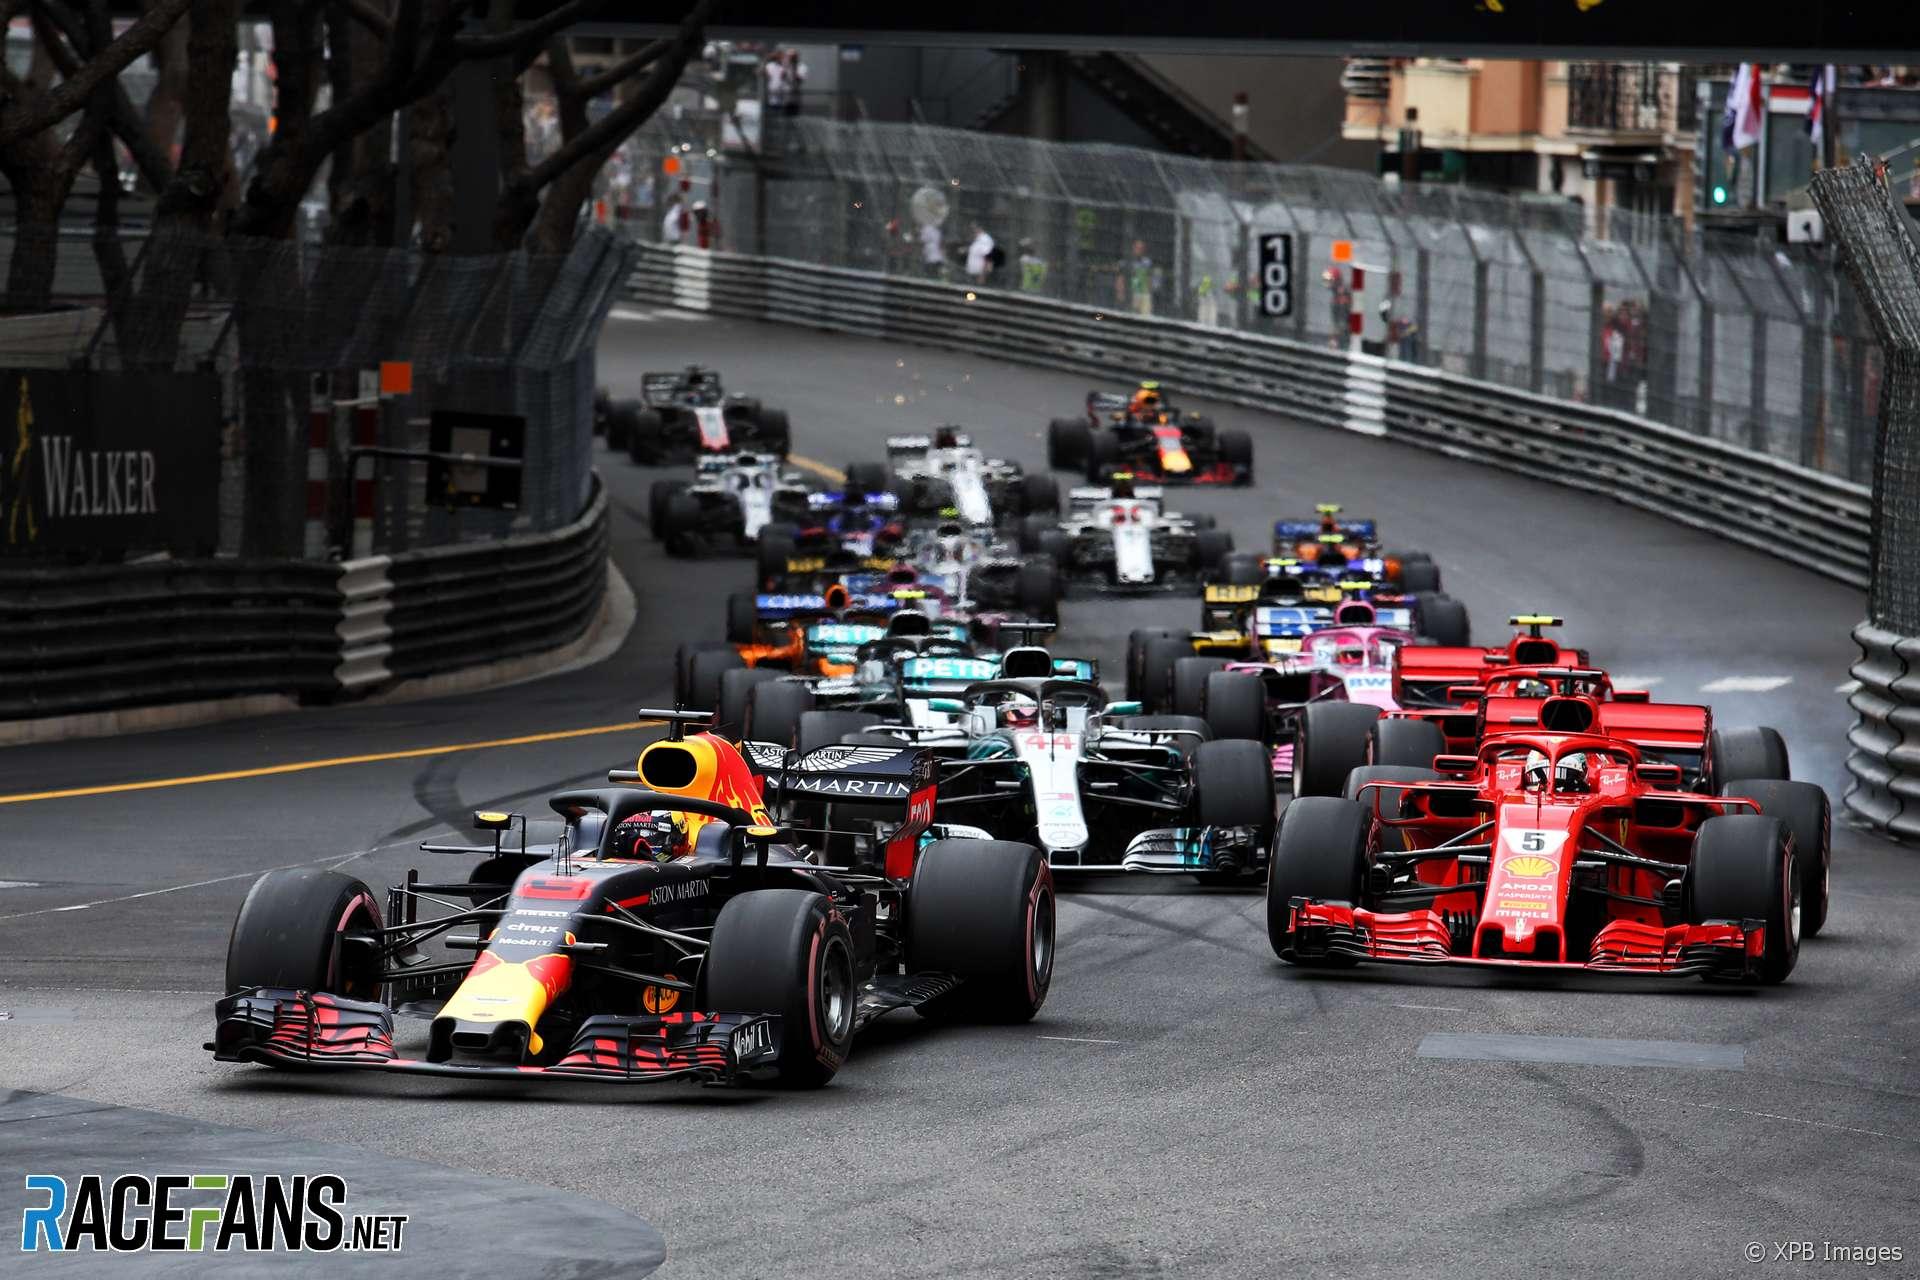 2019 Monaco Grand Prix Live F1 TV times | RaceFans